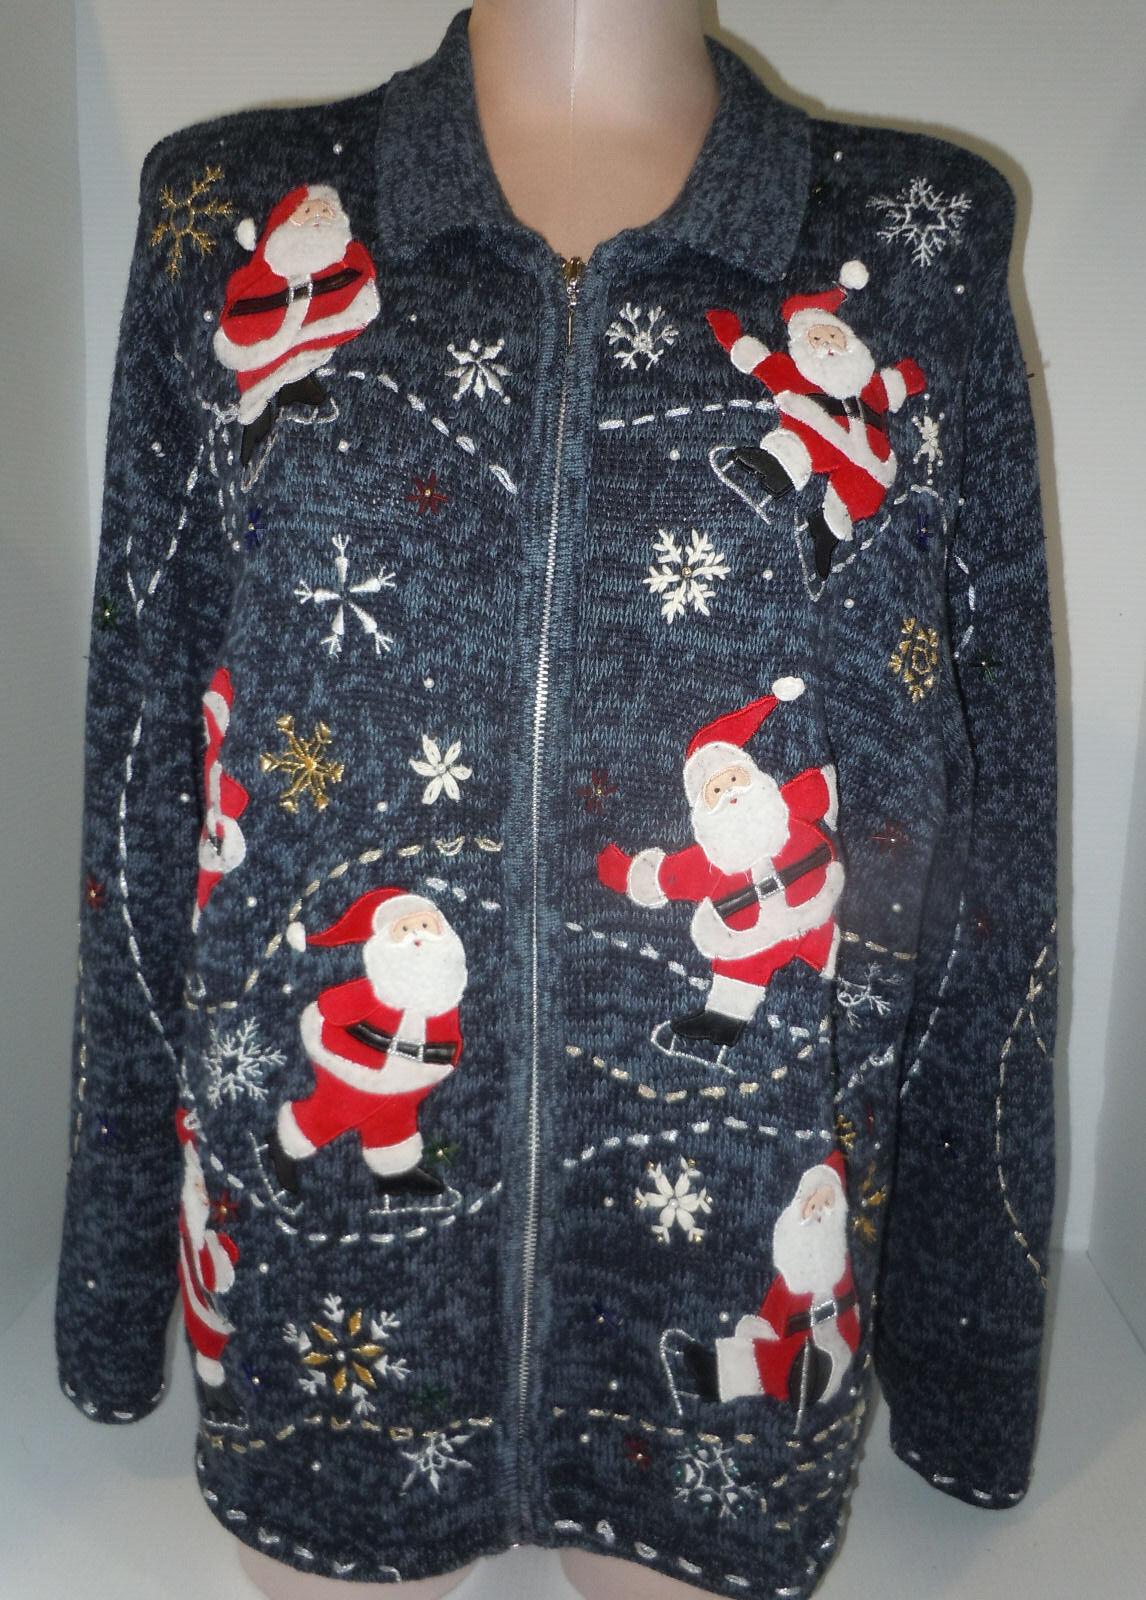 HEMPSHIRE STUDIO Womens Christmas Ugly Sweater bluee Red White Santa Sz 1X Plus